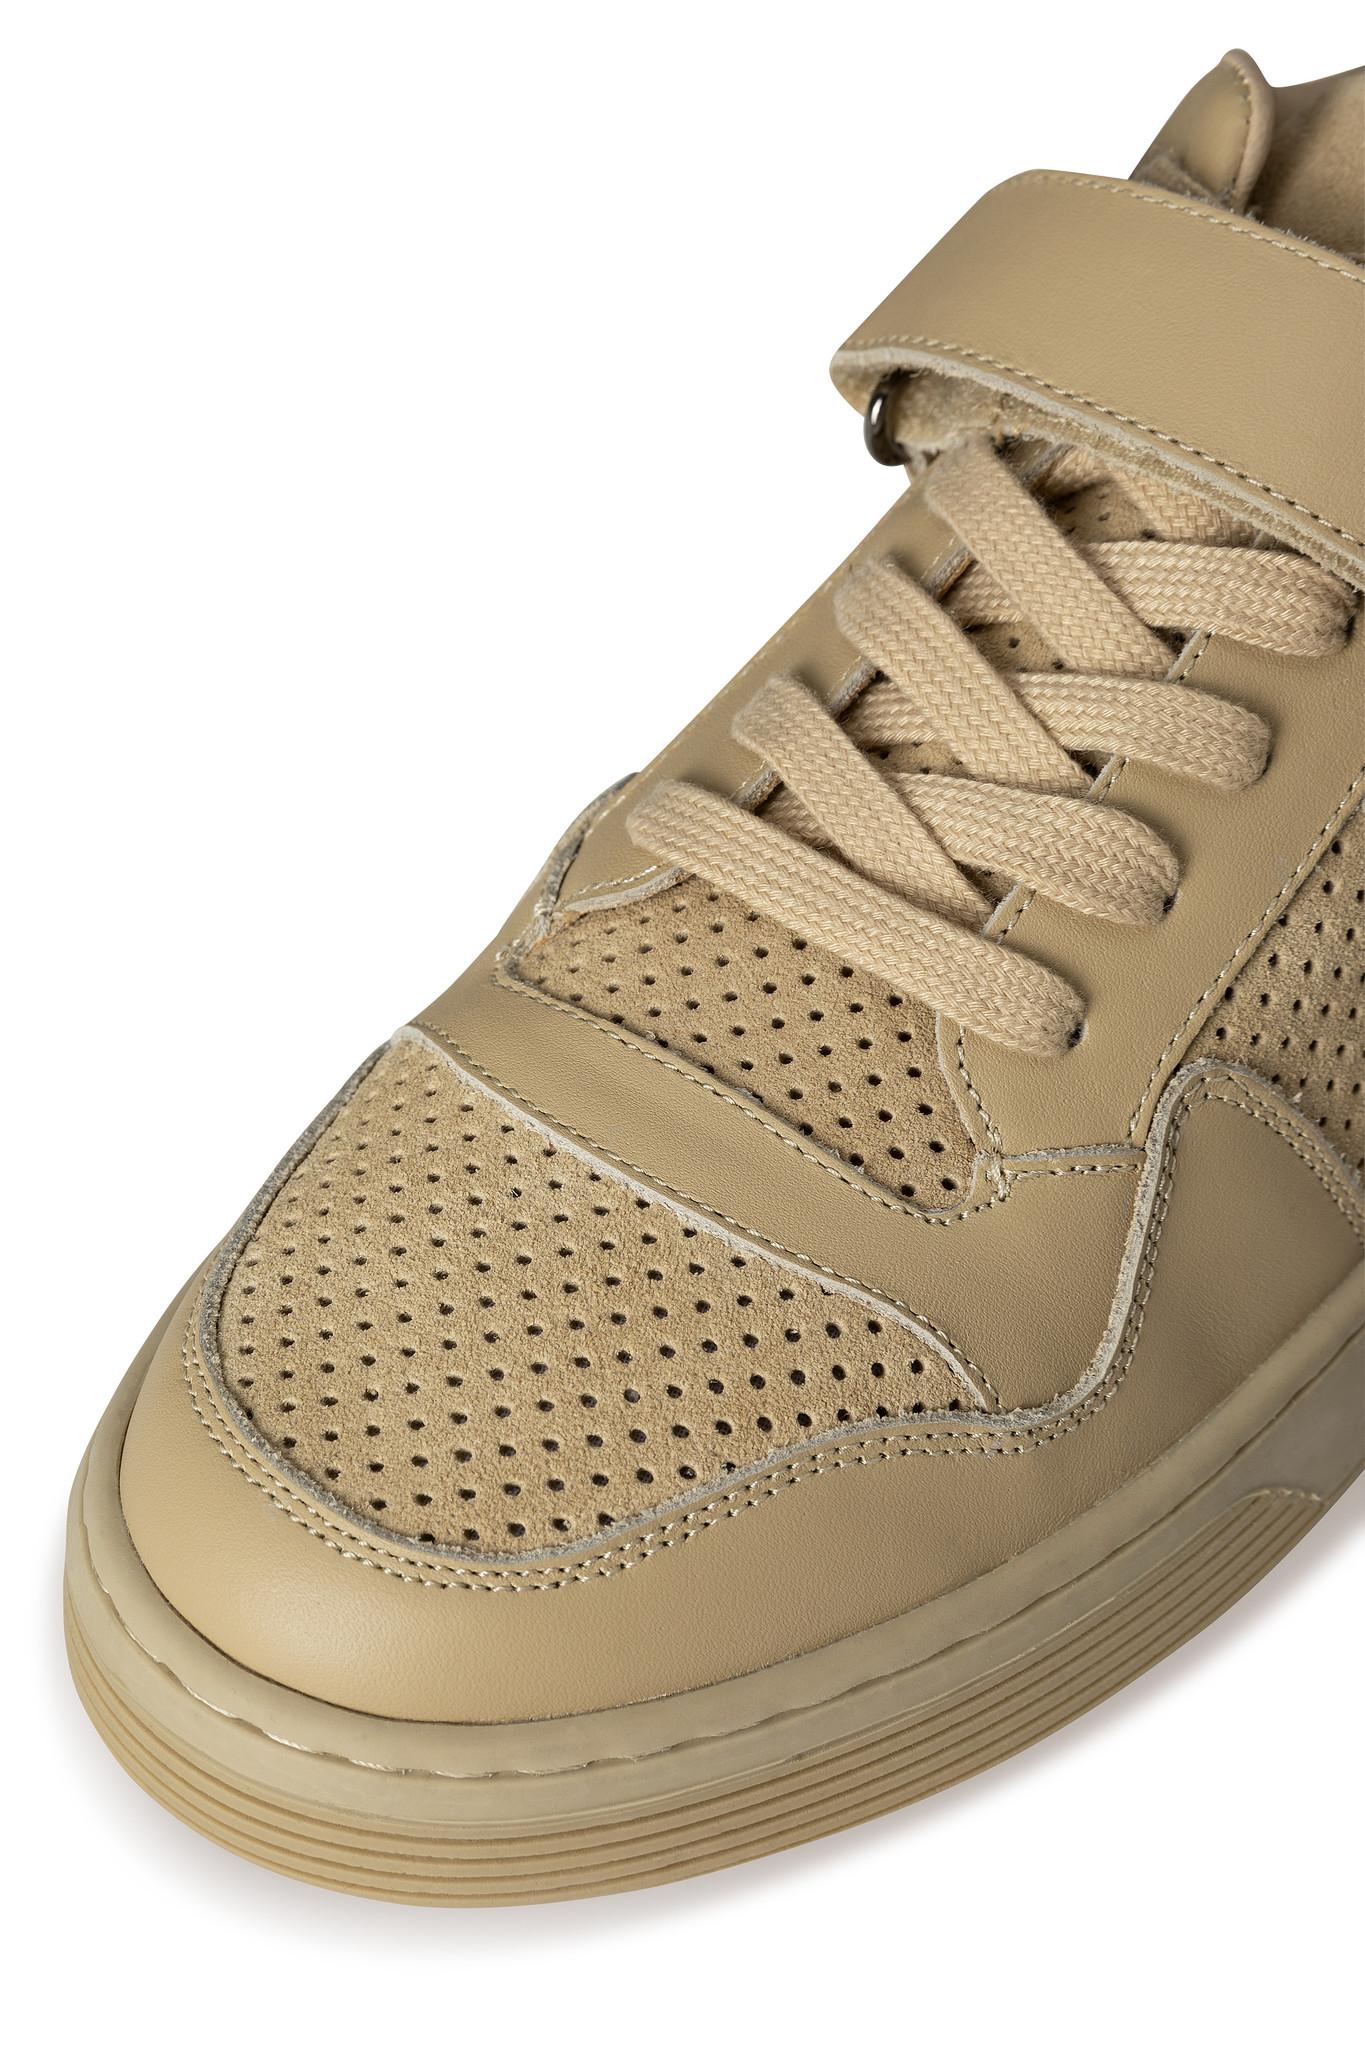 yaya Retro sneakers 134379-112-3